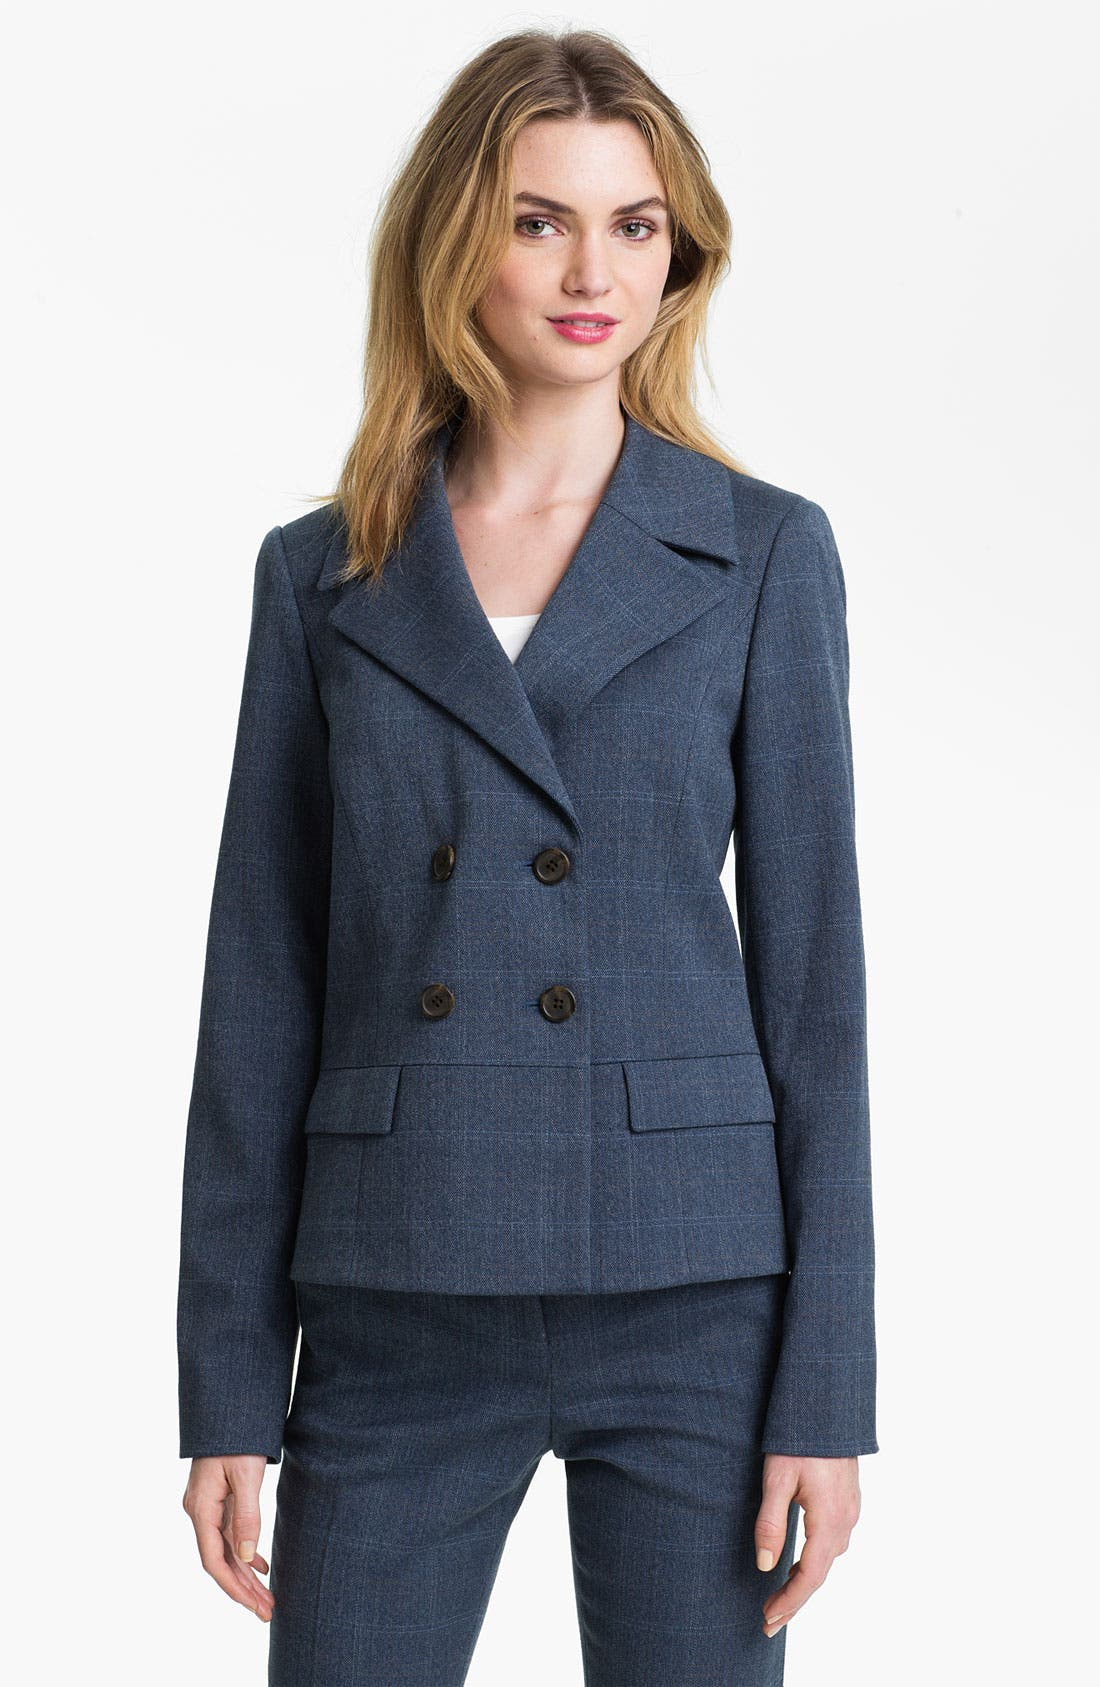 Alternate Image 1 Selected - Anne Klein Patterned Menswear Jacket